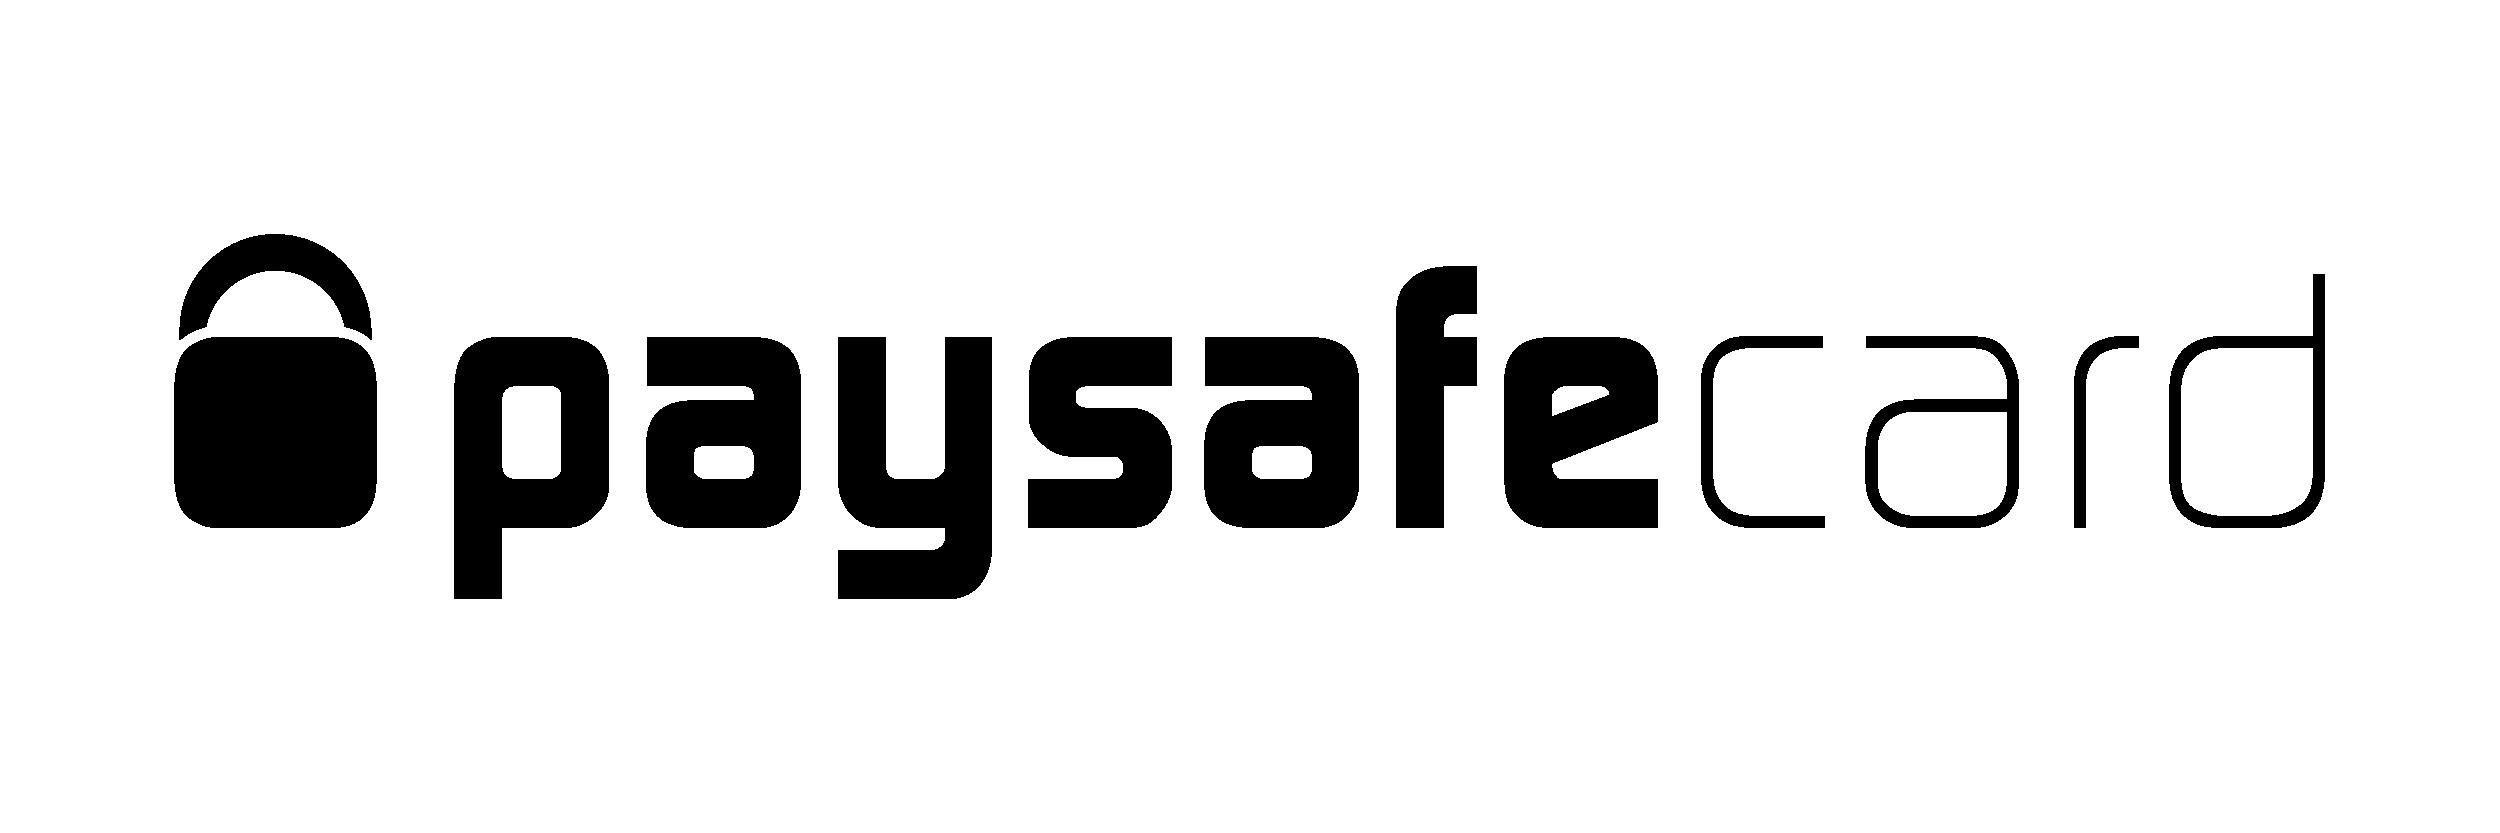 logo-paysafecard-einfaerbig.png